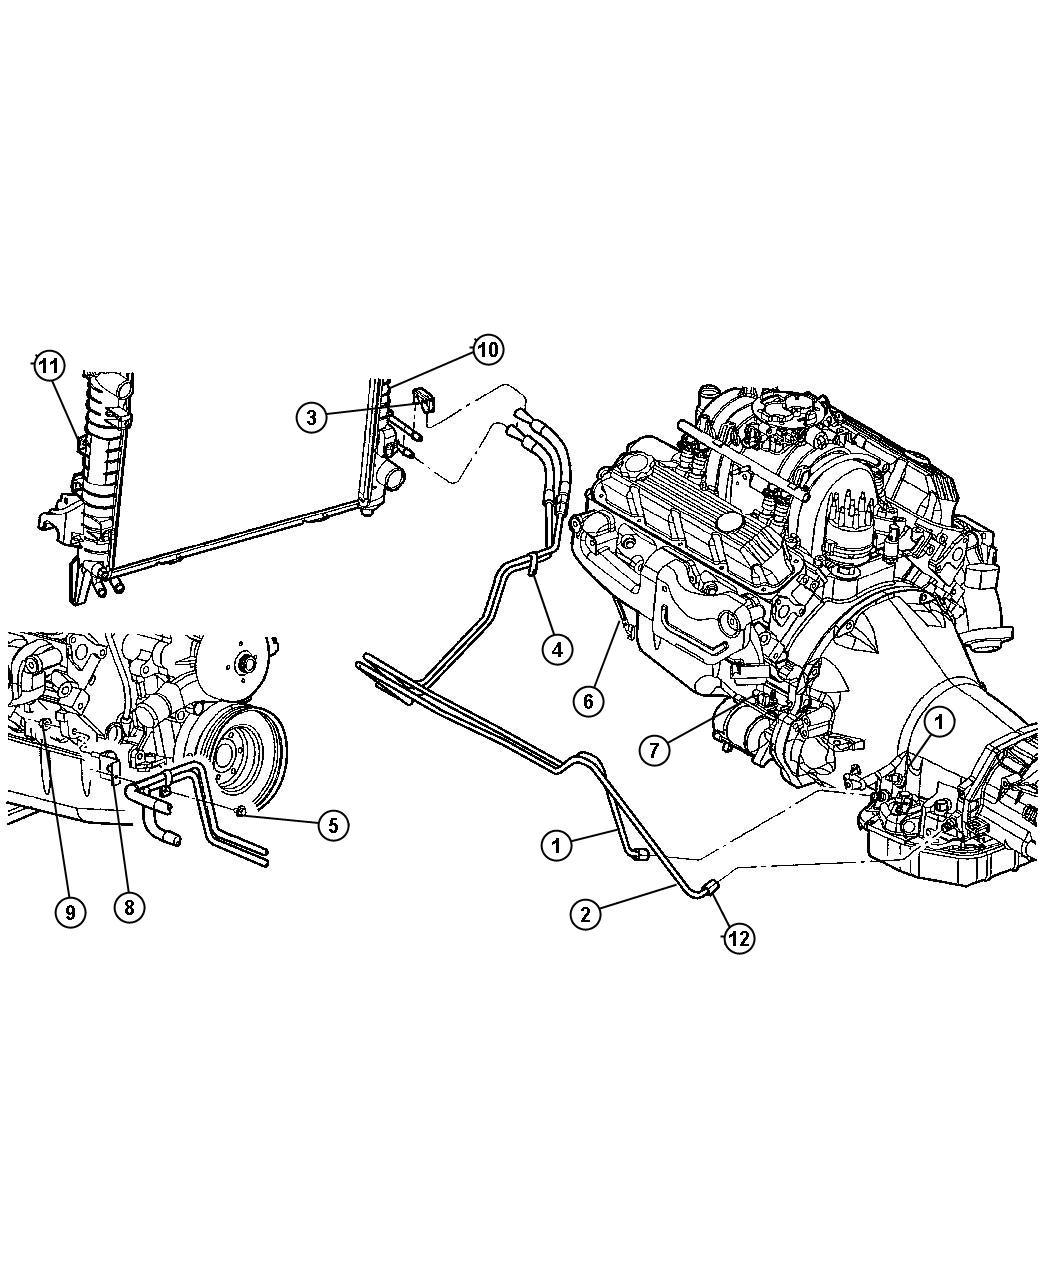 2004 Dodge Ram Hid Wiring Harness. Dodge. Auto Wiring Diagram